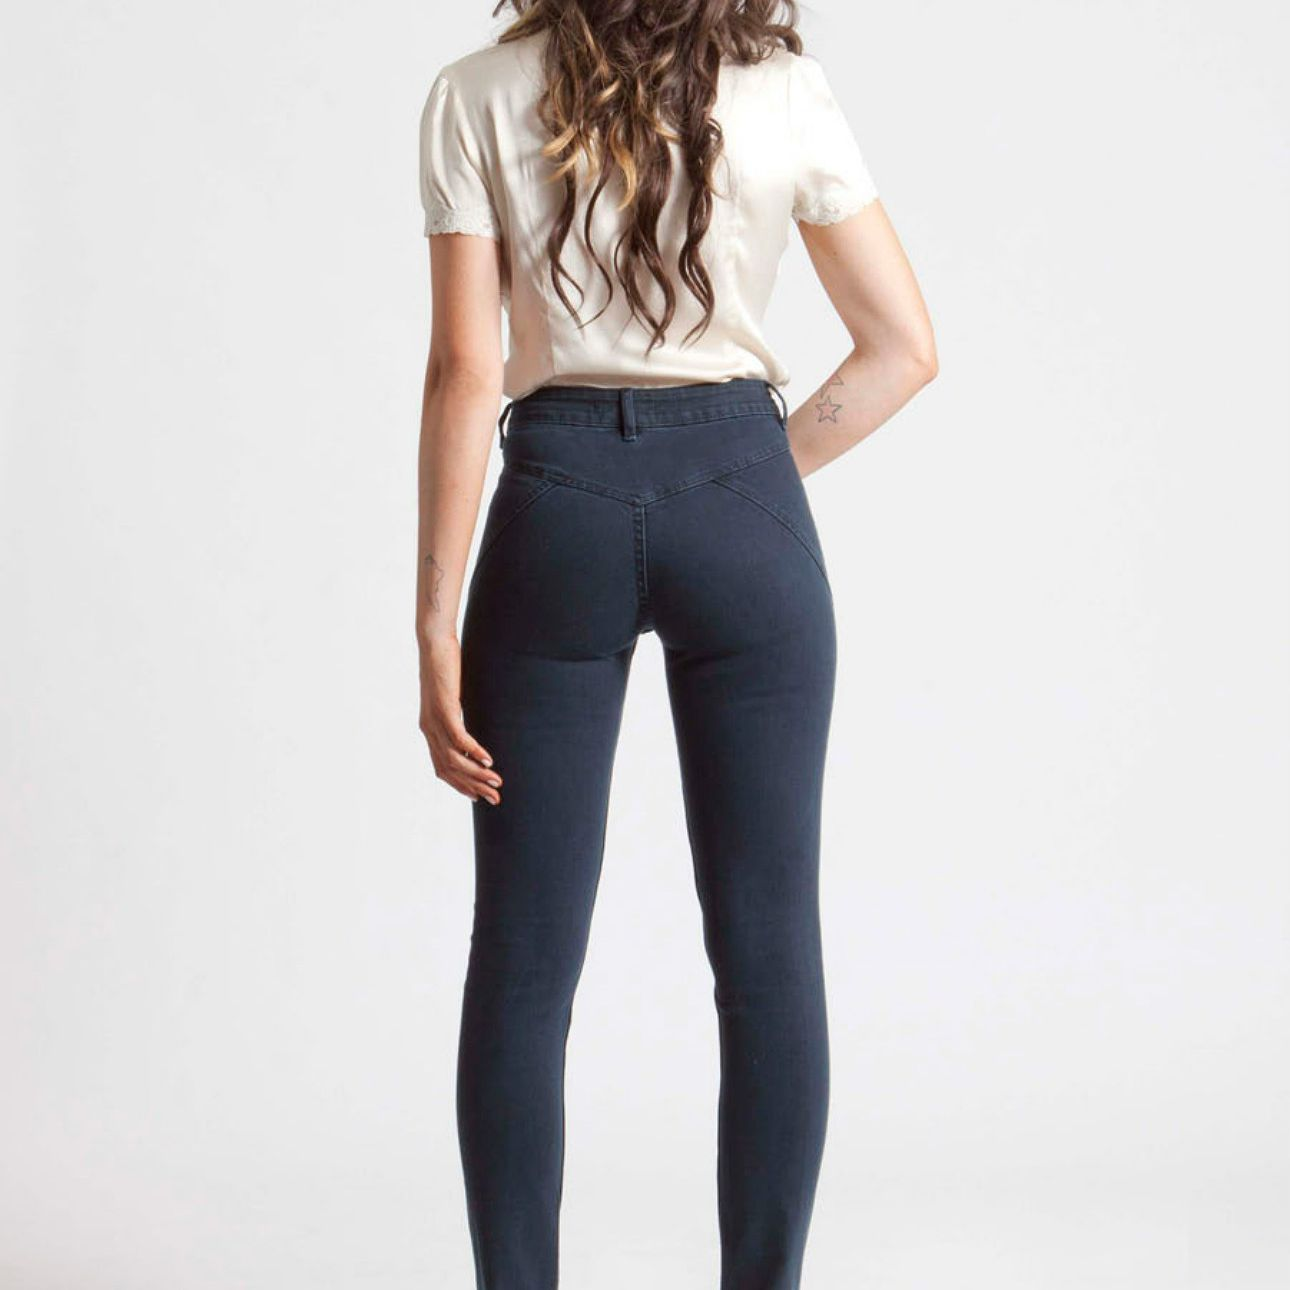 Court-High-Waisted-Jeans.jpg